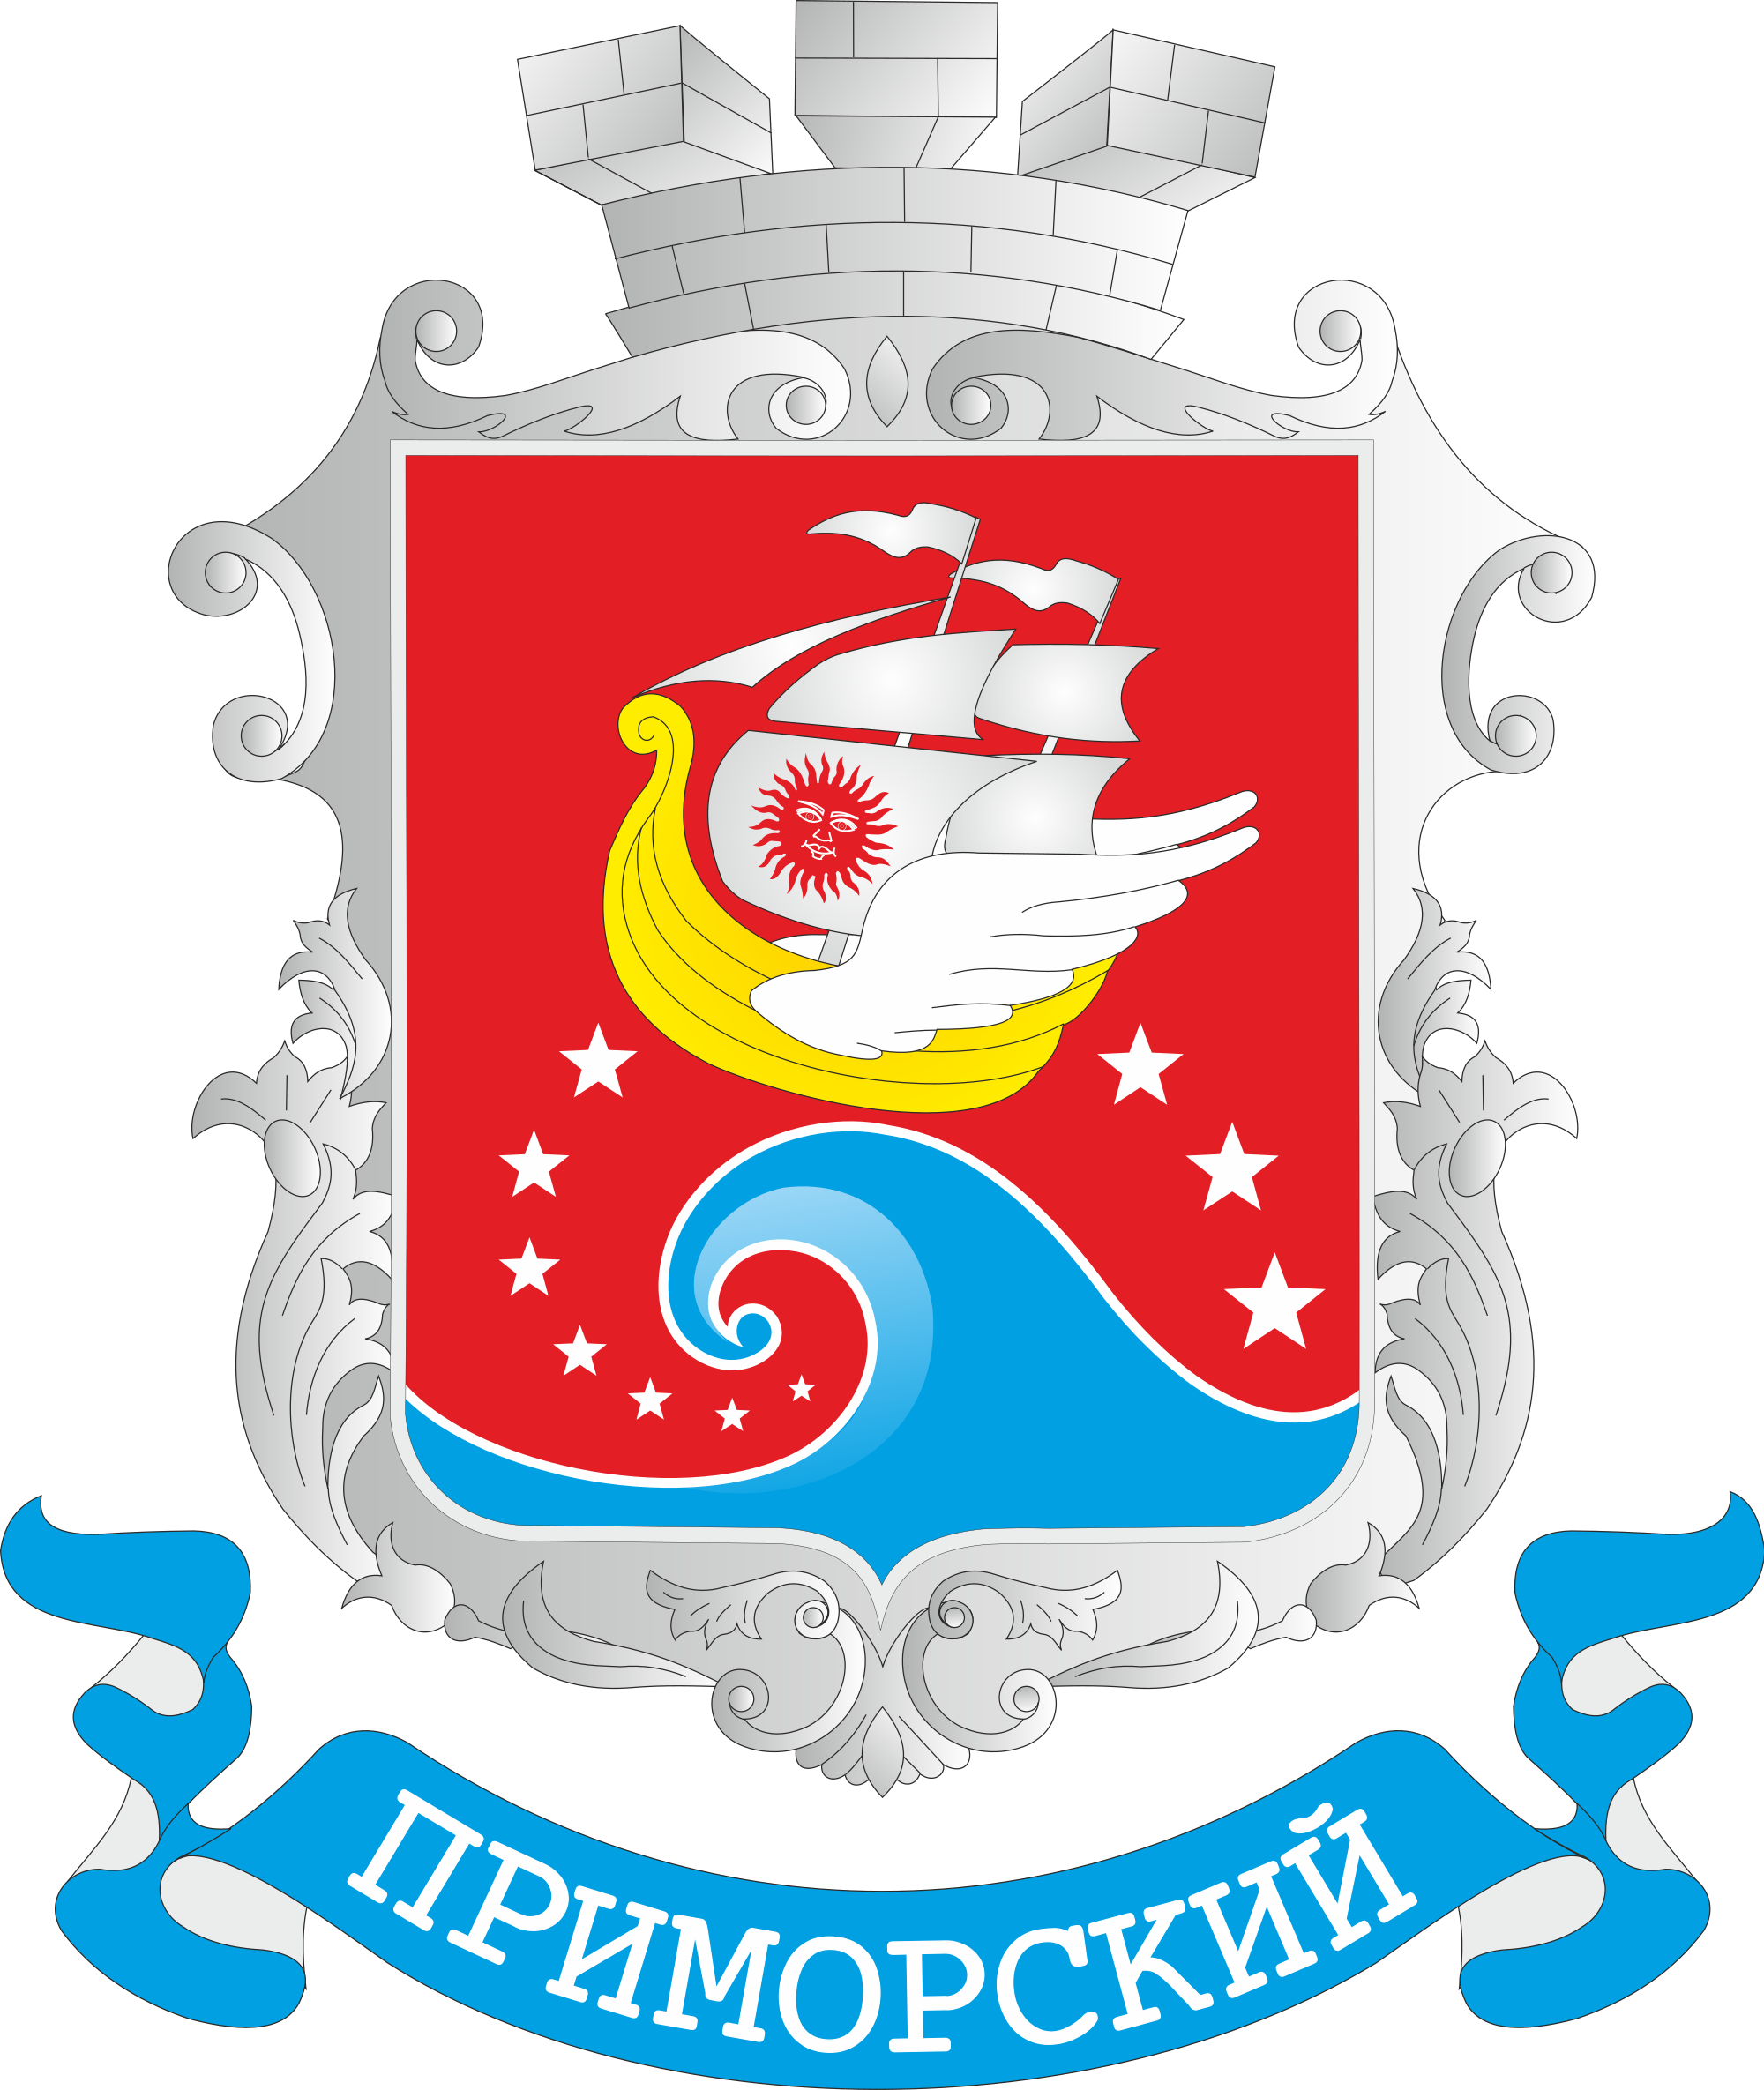 Crimea svg #1, Download drawings